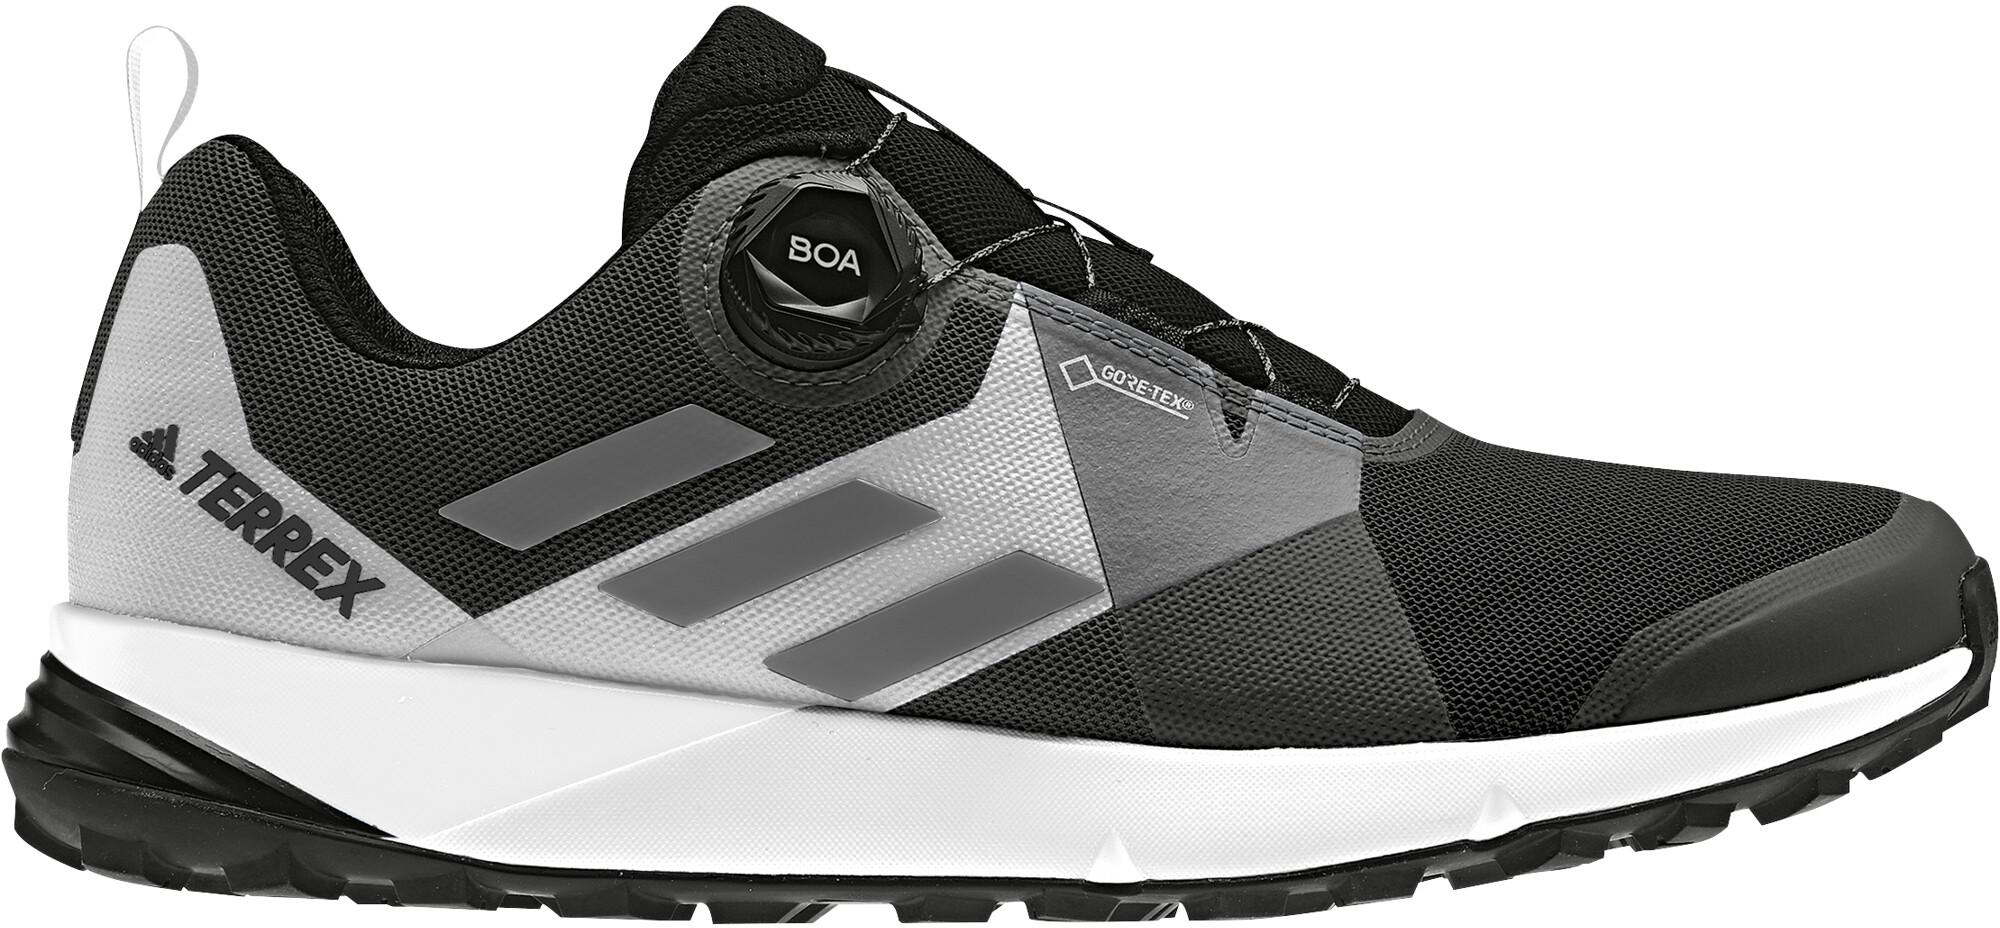 adidas TERREX Two Boa GTX Sko Damer, core black/grey four/ftwr white   Shoes and overlays